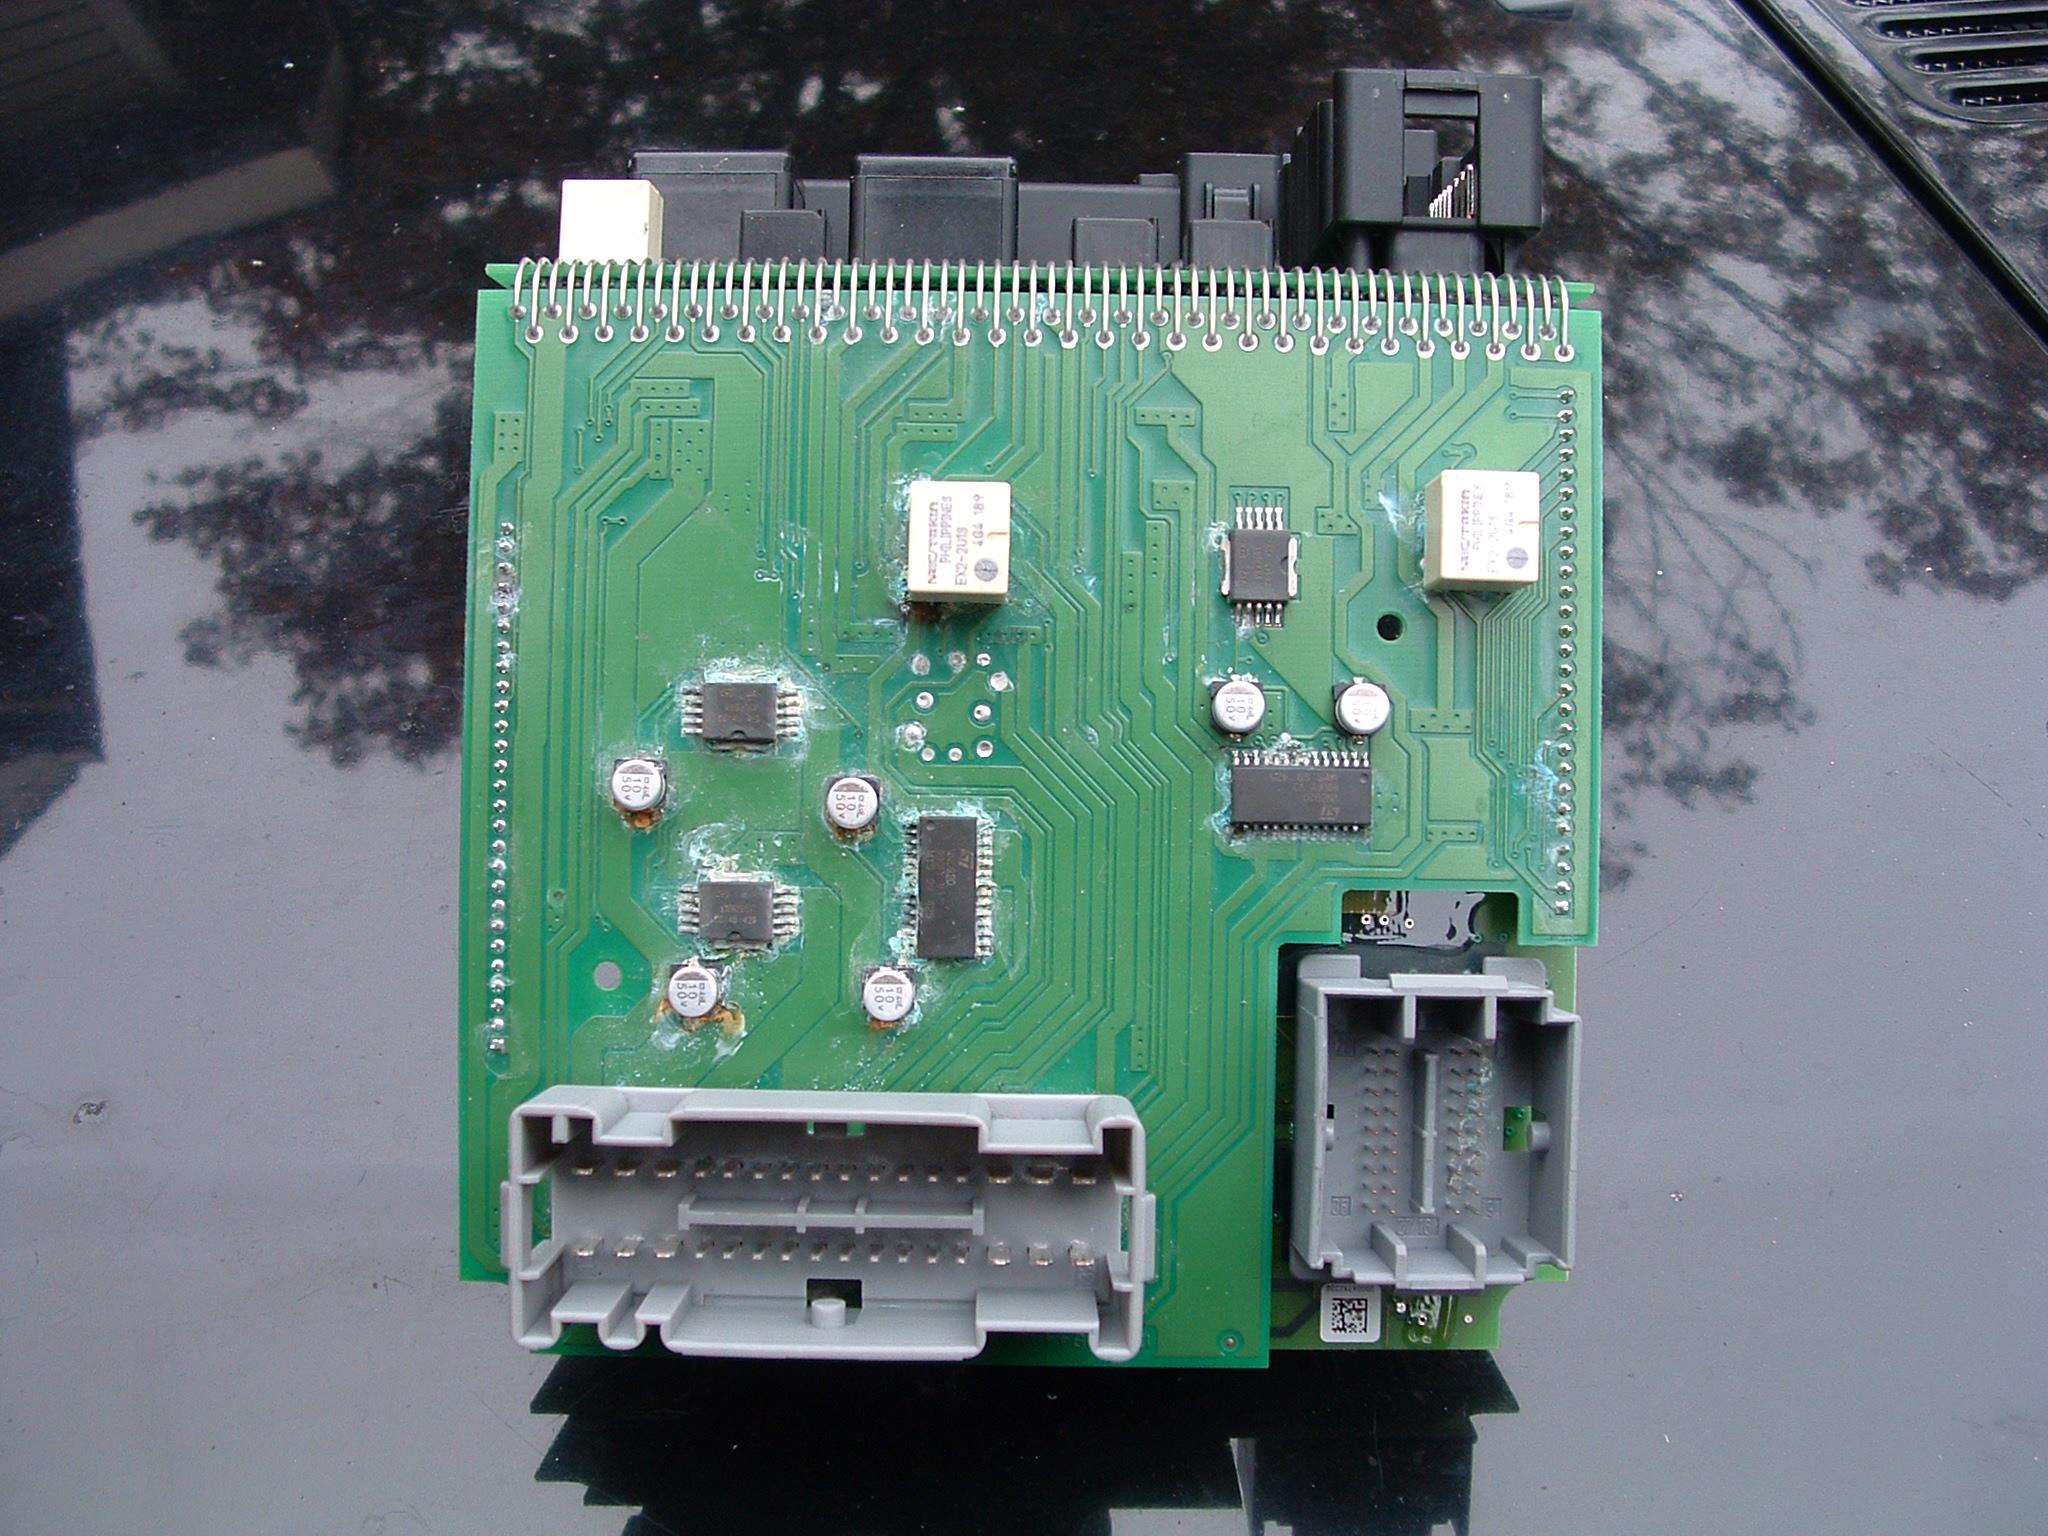 2005 xc90 cem corrosion volvo forums rh thevolvoforums com 3-Way Switch Wiring Diagram Basic Electrical Wiring Diagrams